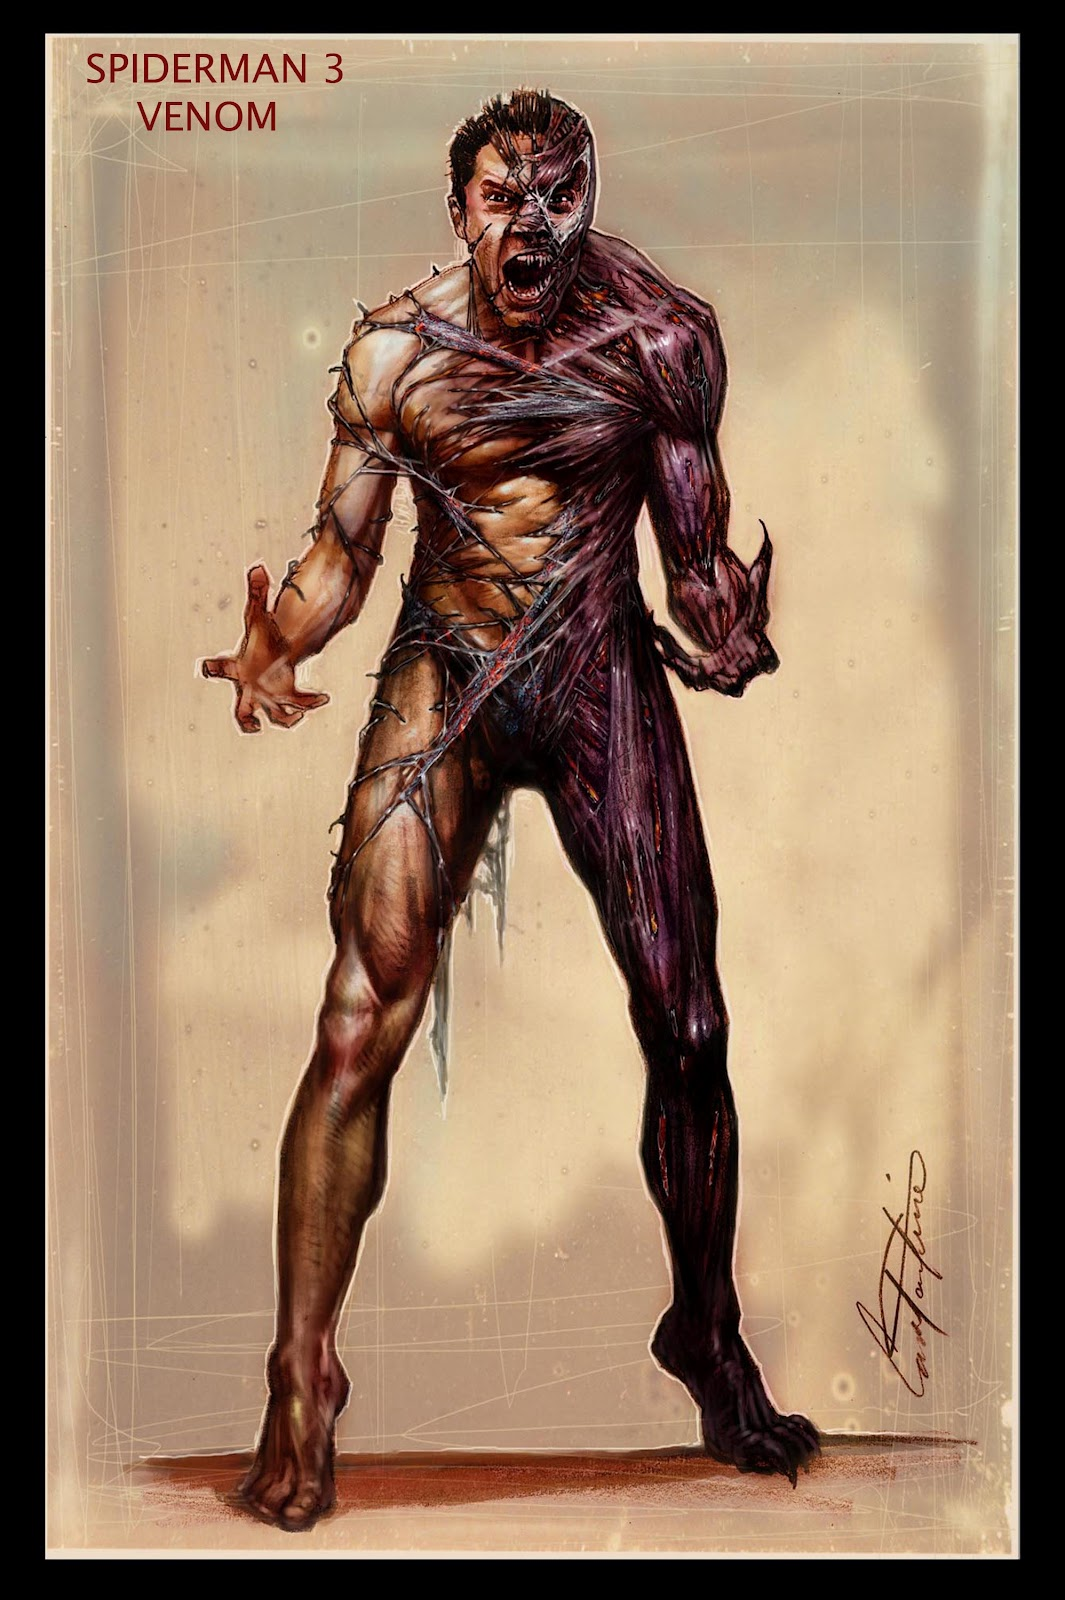 Film Sketchr: See the Venom You Didn't See in SPIDER-MAN 3 ... Tobey Maguire Movie List